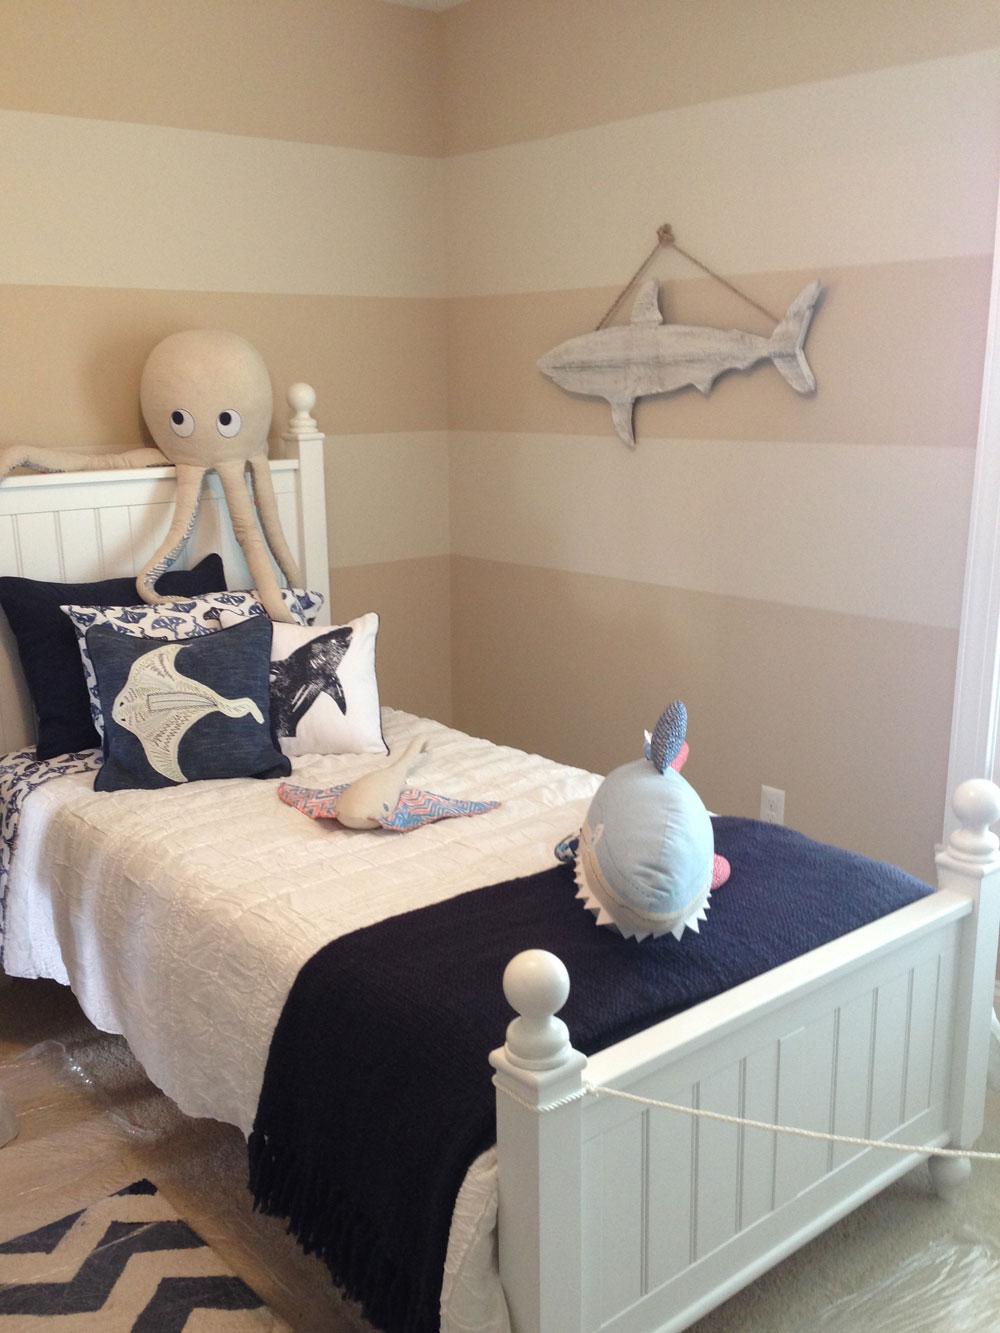 Octopus_Room